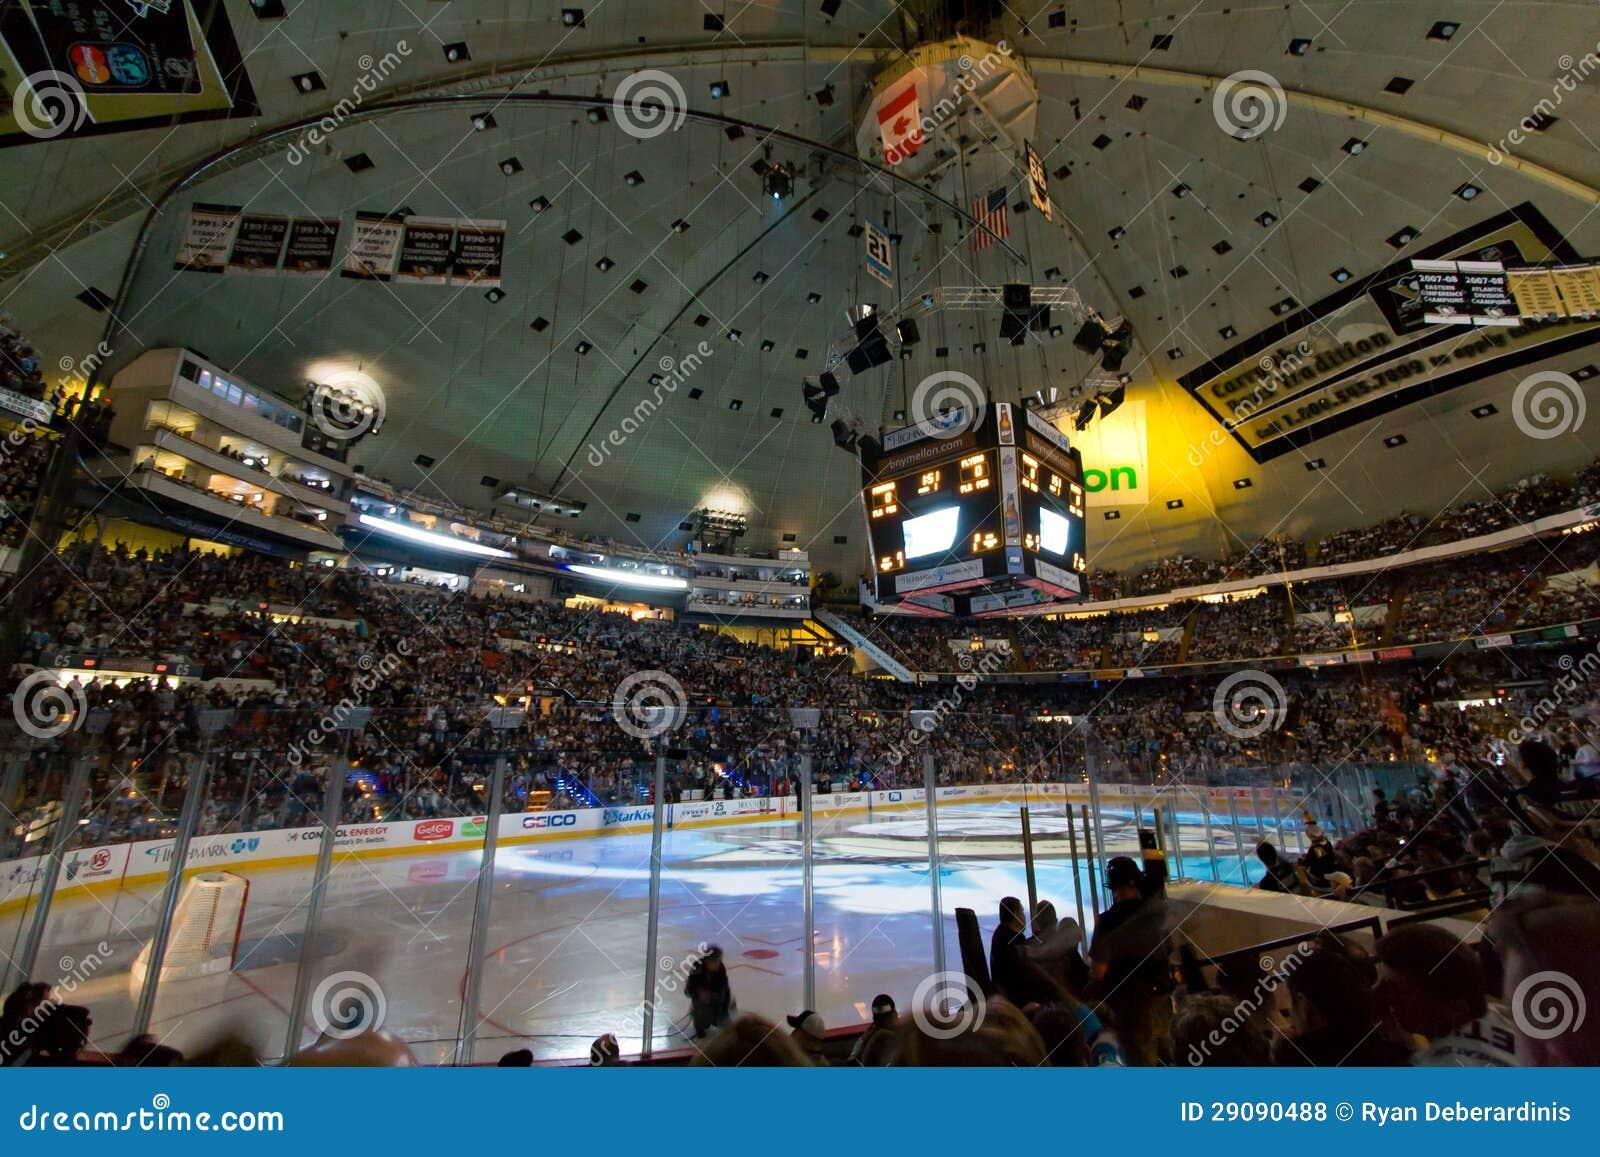 NHL Hockey Game Arena